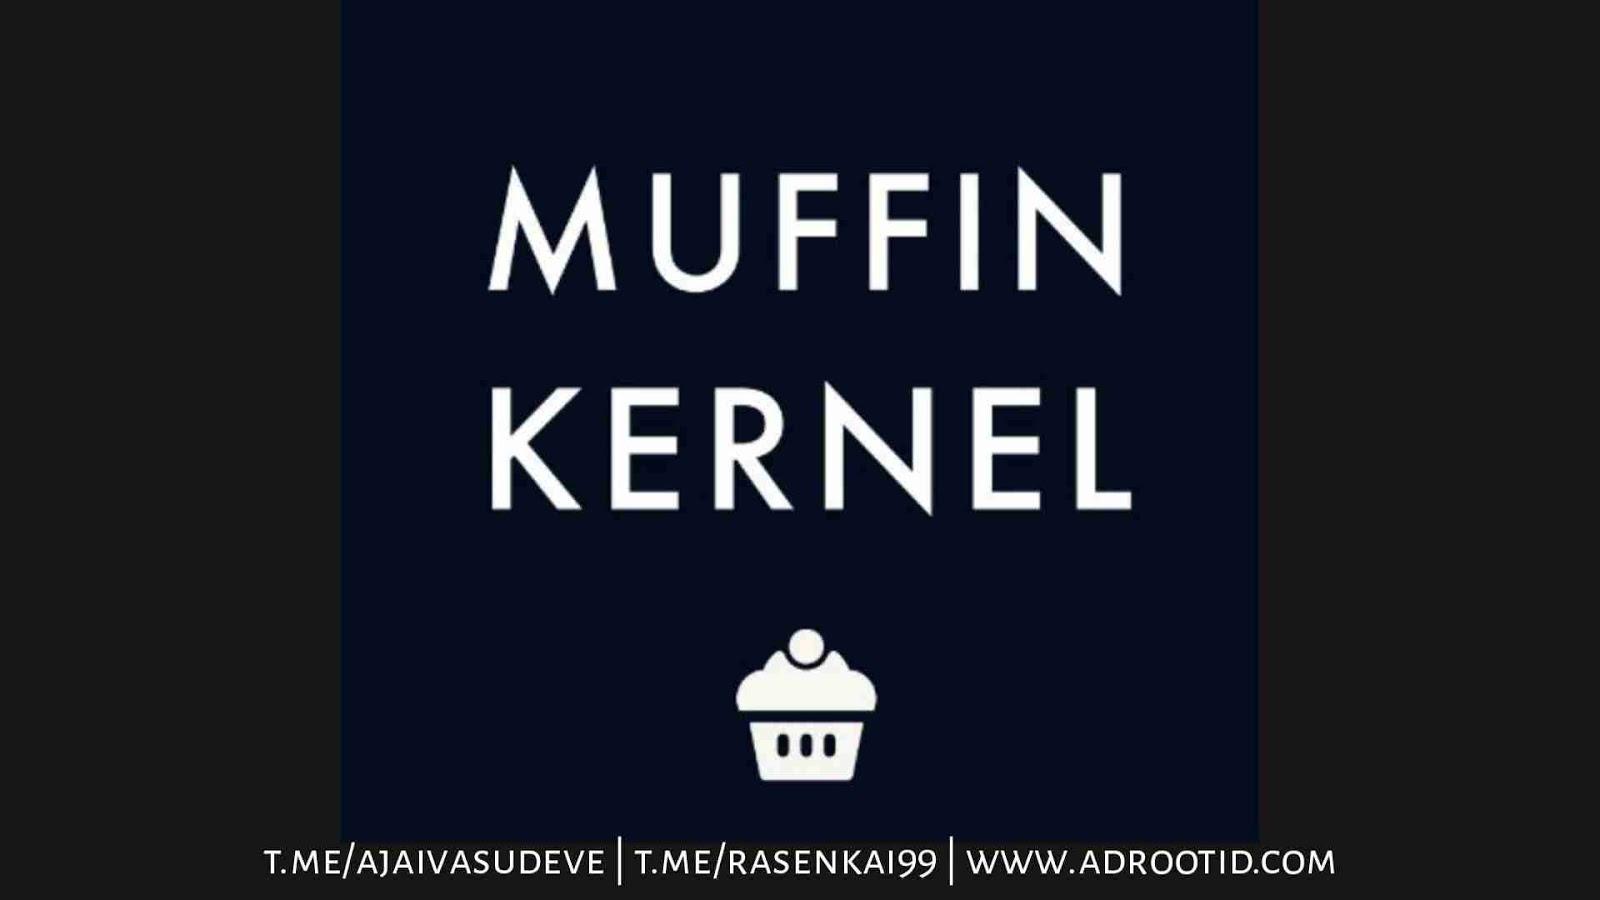 Kernel muffin max pro m1